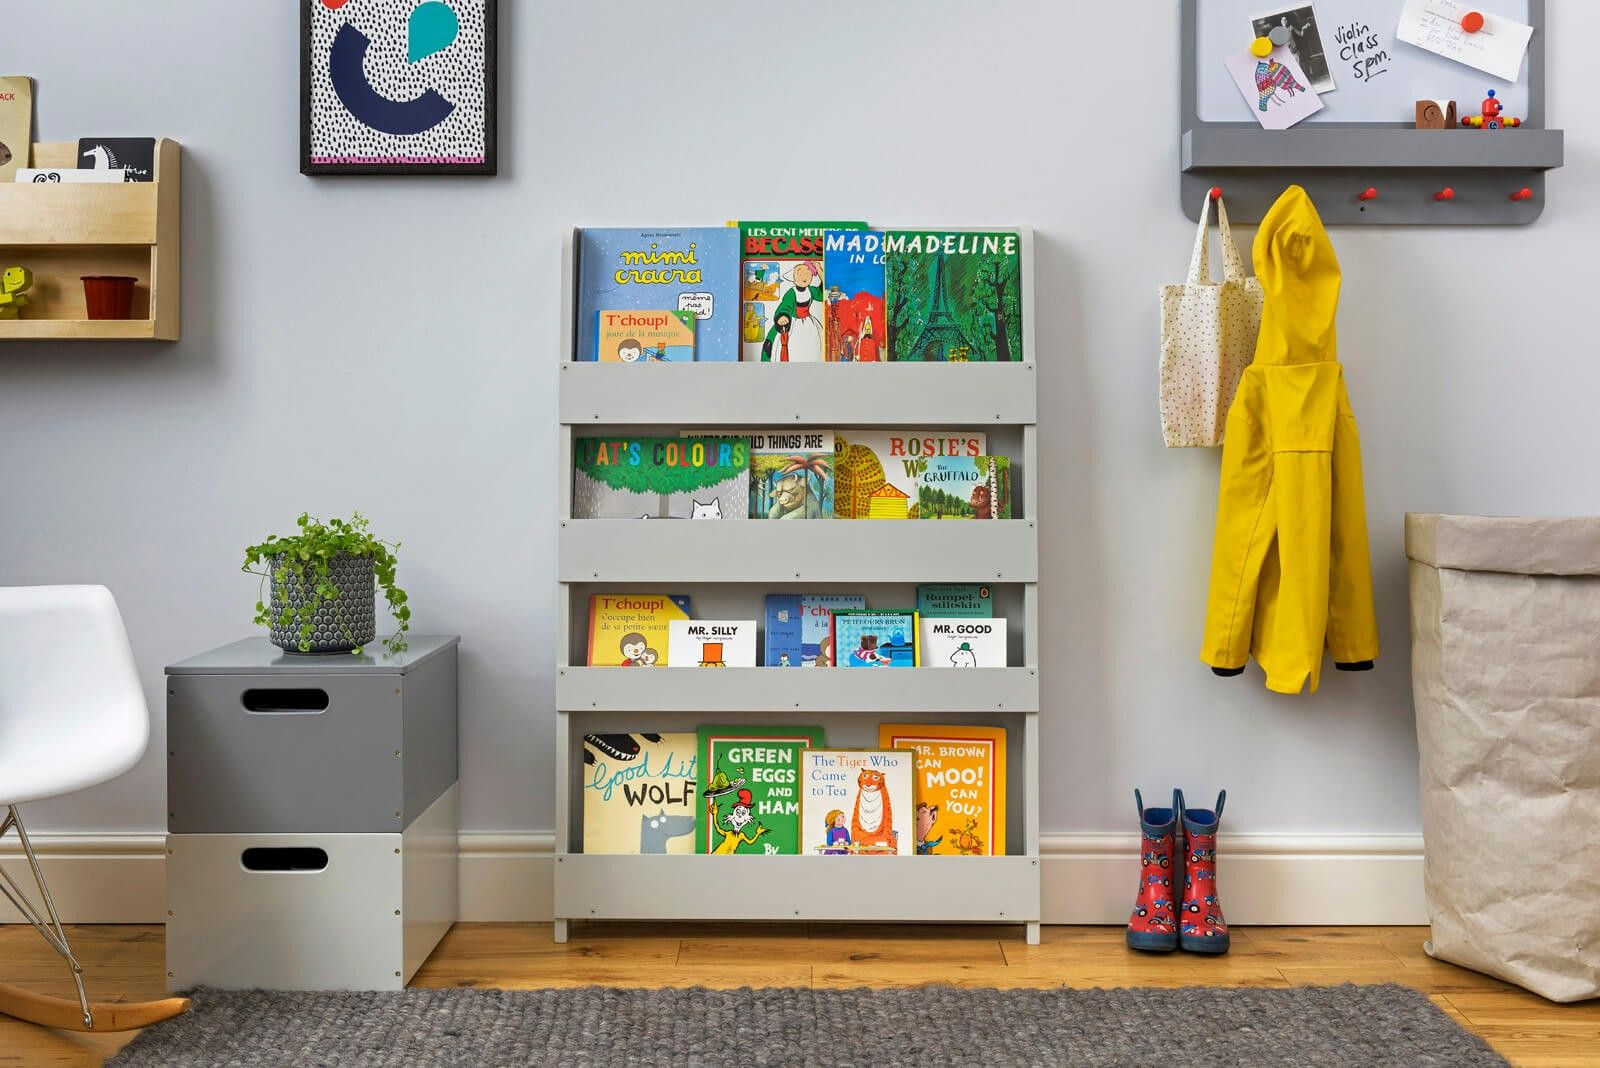 Full Size of Bücherregal Kinderzimmer Bcherregale Bcherregal Kinder Sofa Regale Regal Weiß Kinderzimmer Bücherregal Kinderzimmer